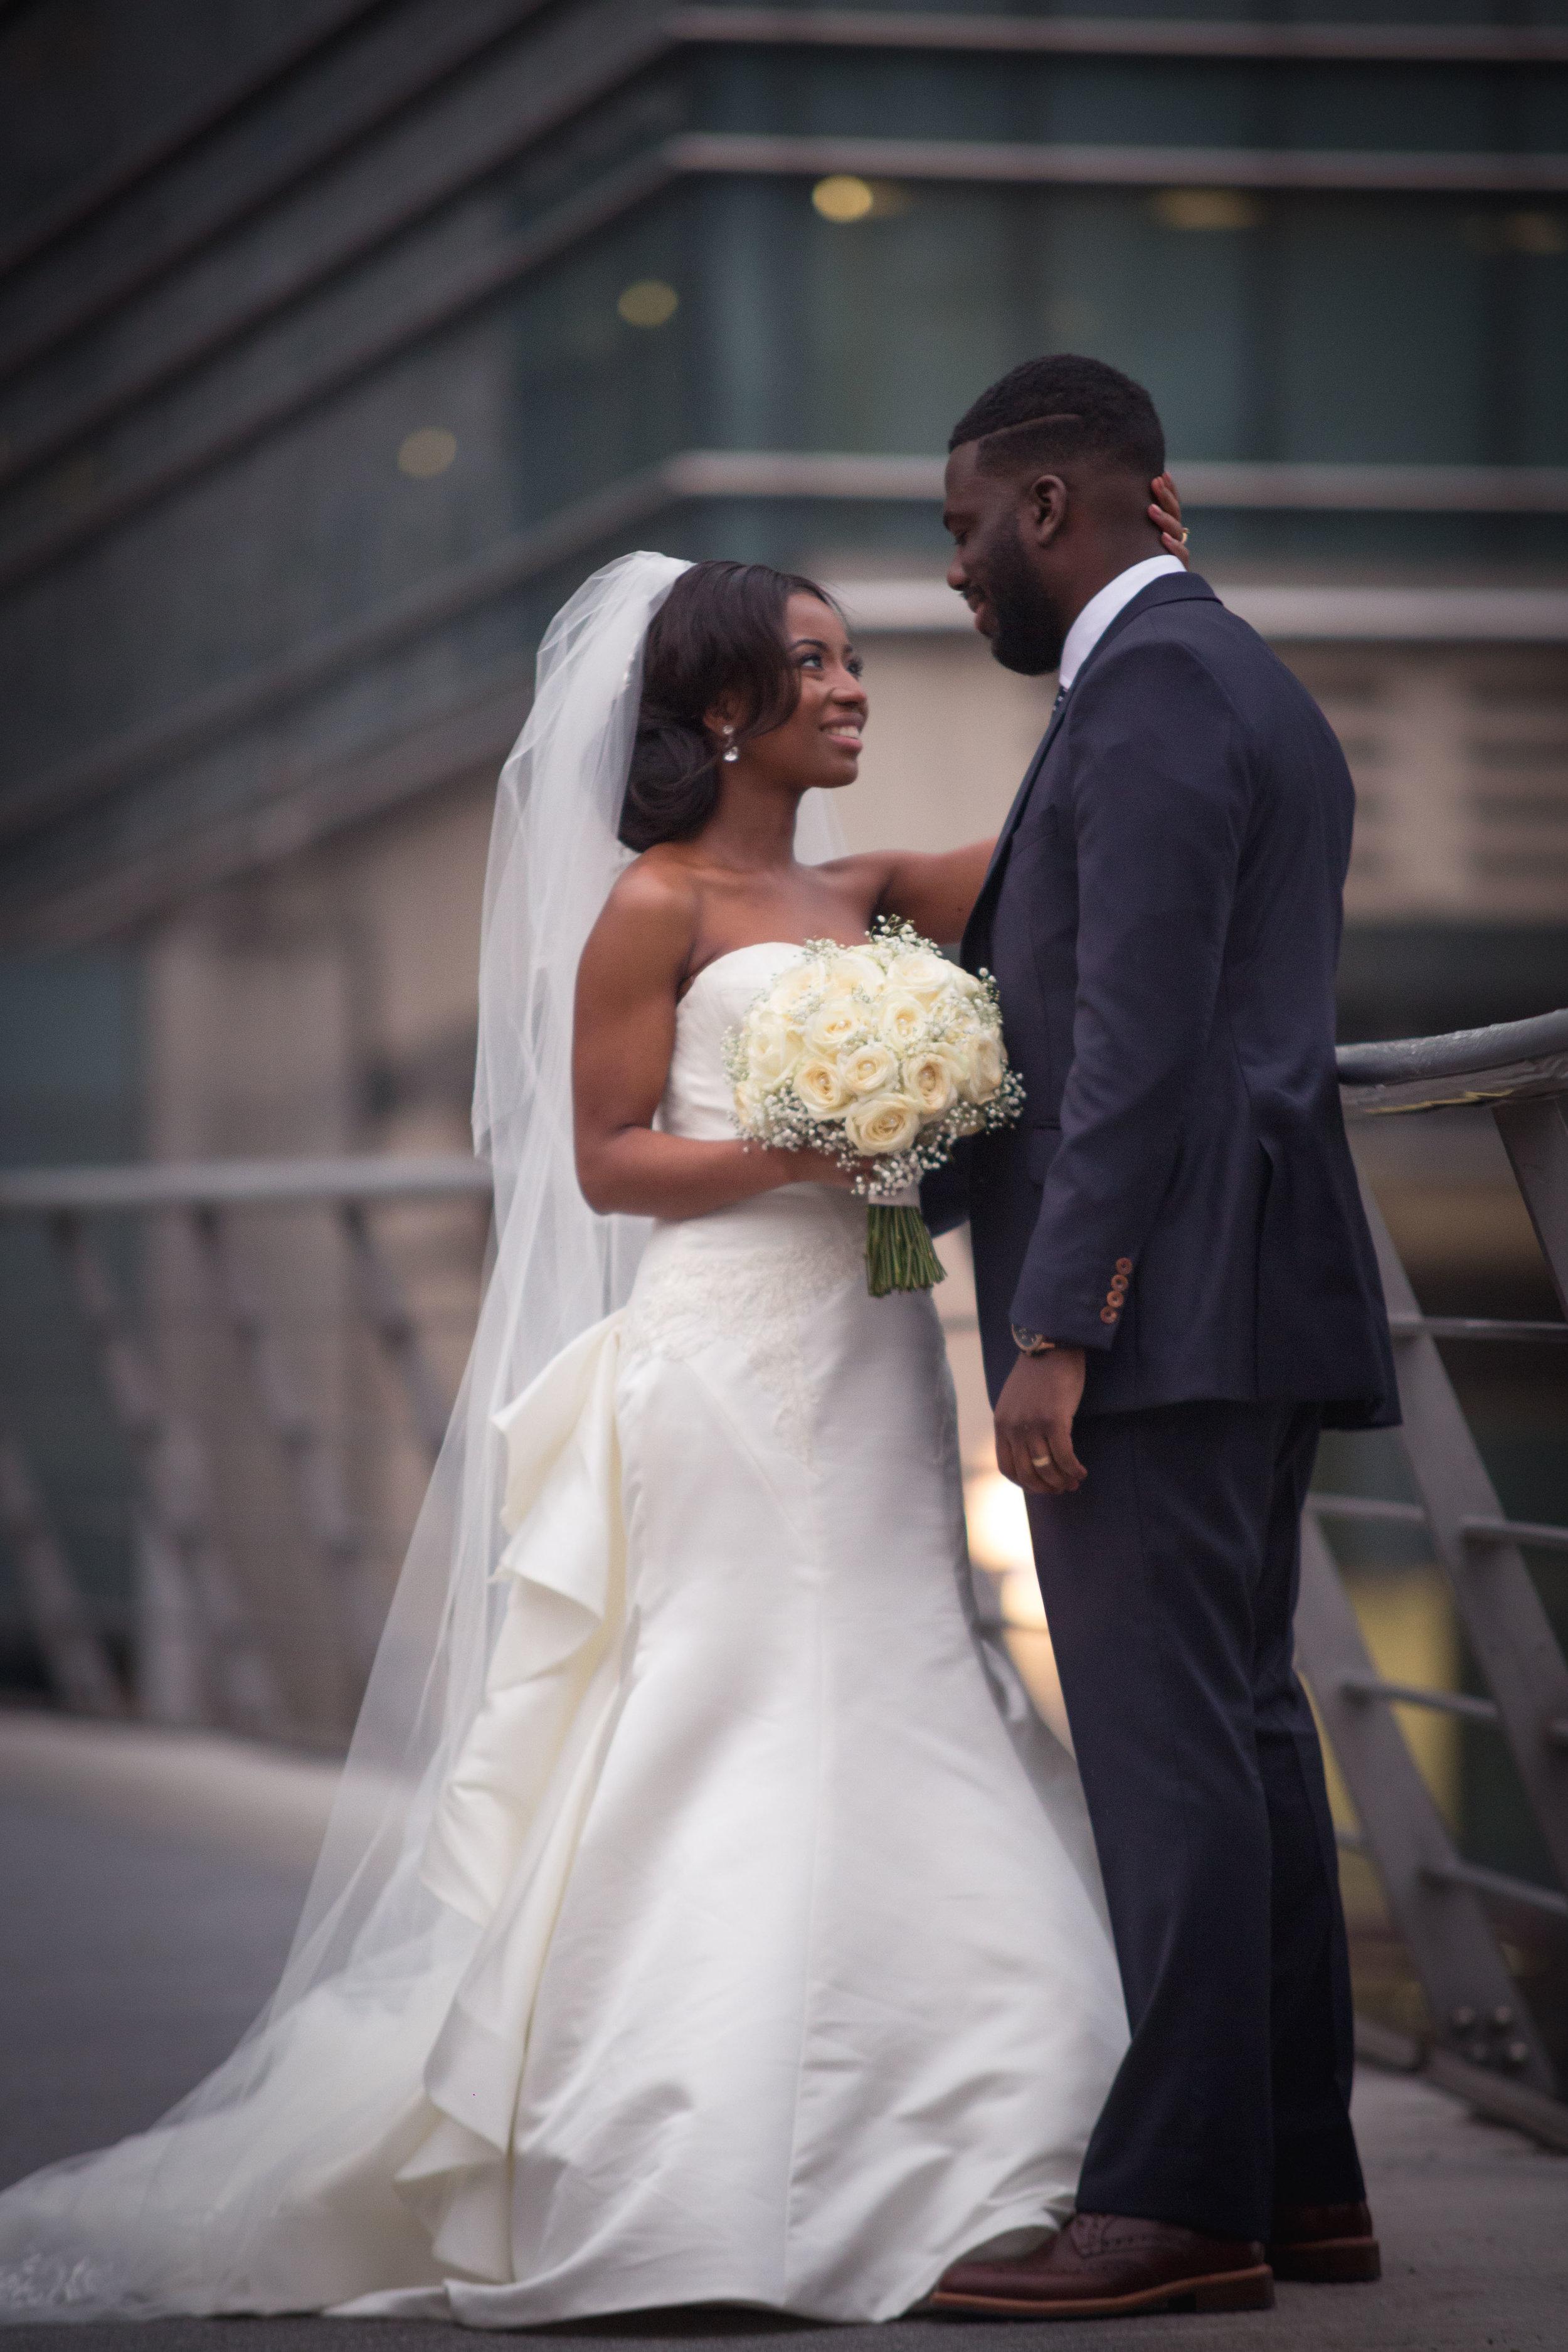 Nyam-Ola-London-wedding-photography-17.jpg